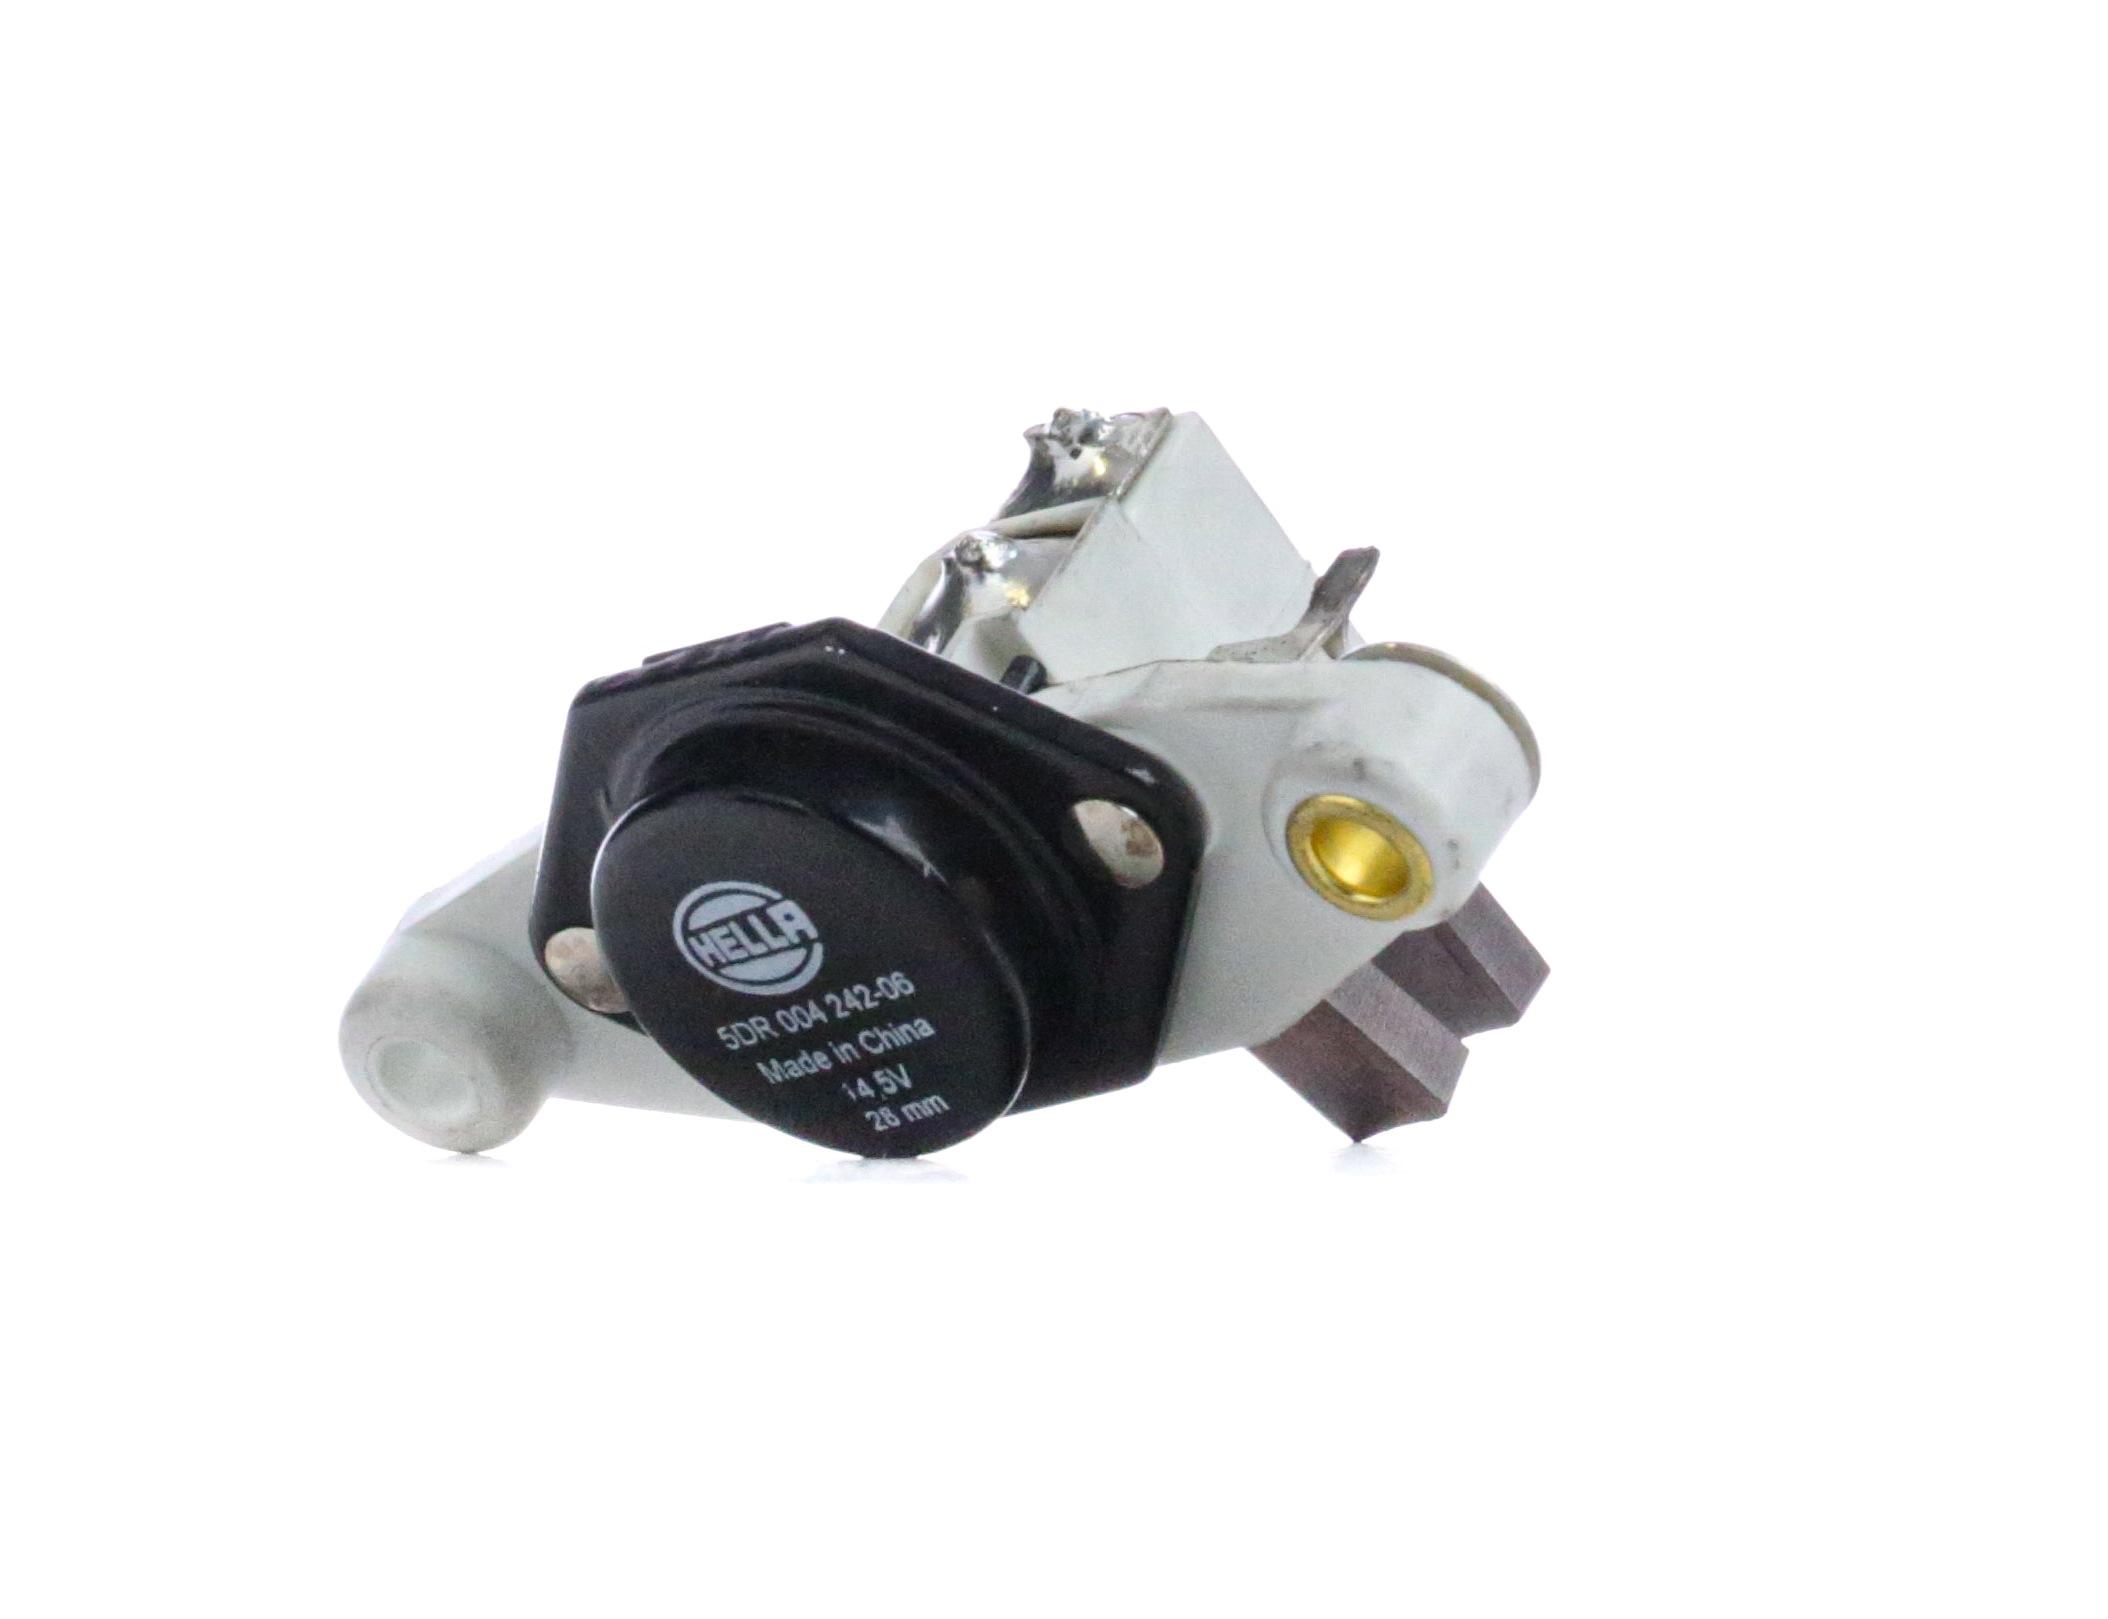 AUDI 80 1992 Regler Lichtmaschine - Original HELLA 5DR 004 242-061 Nennspannung: 12V, Betriebsspannung: 14,5V